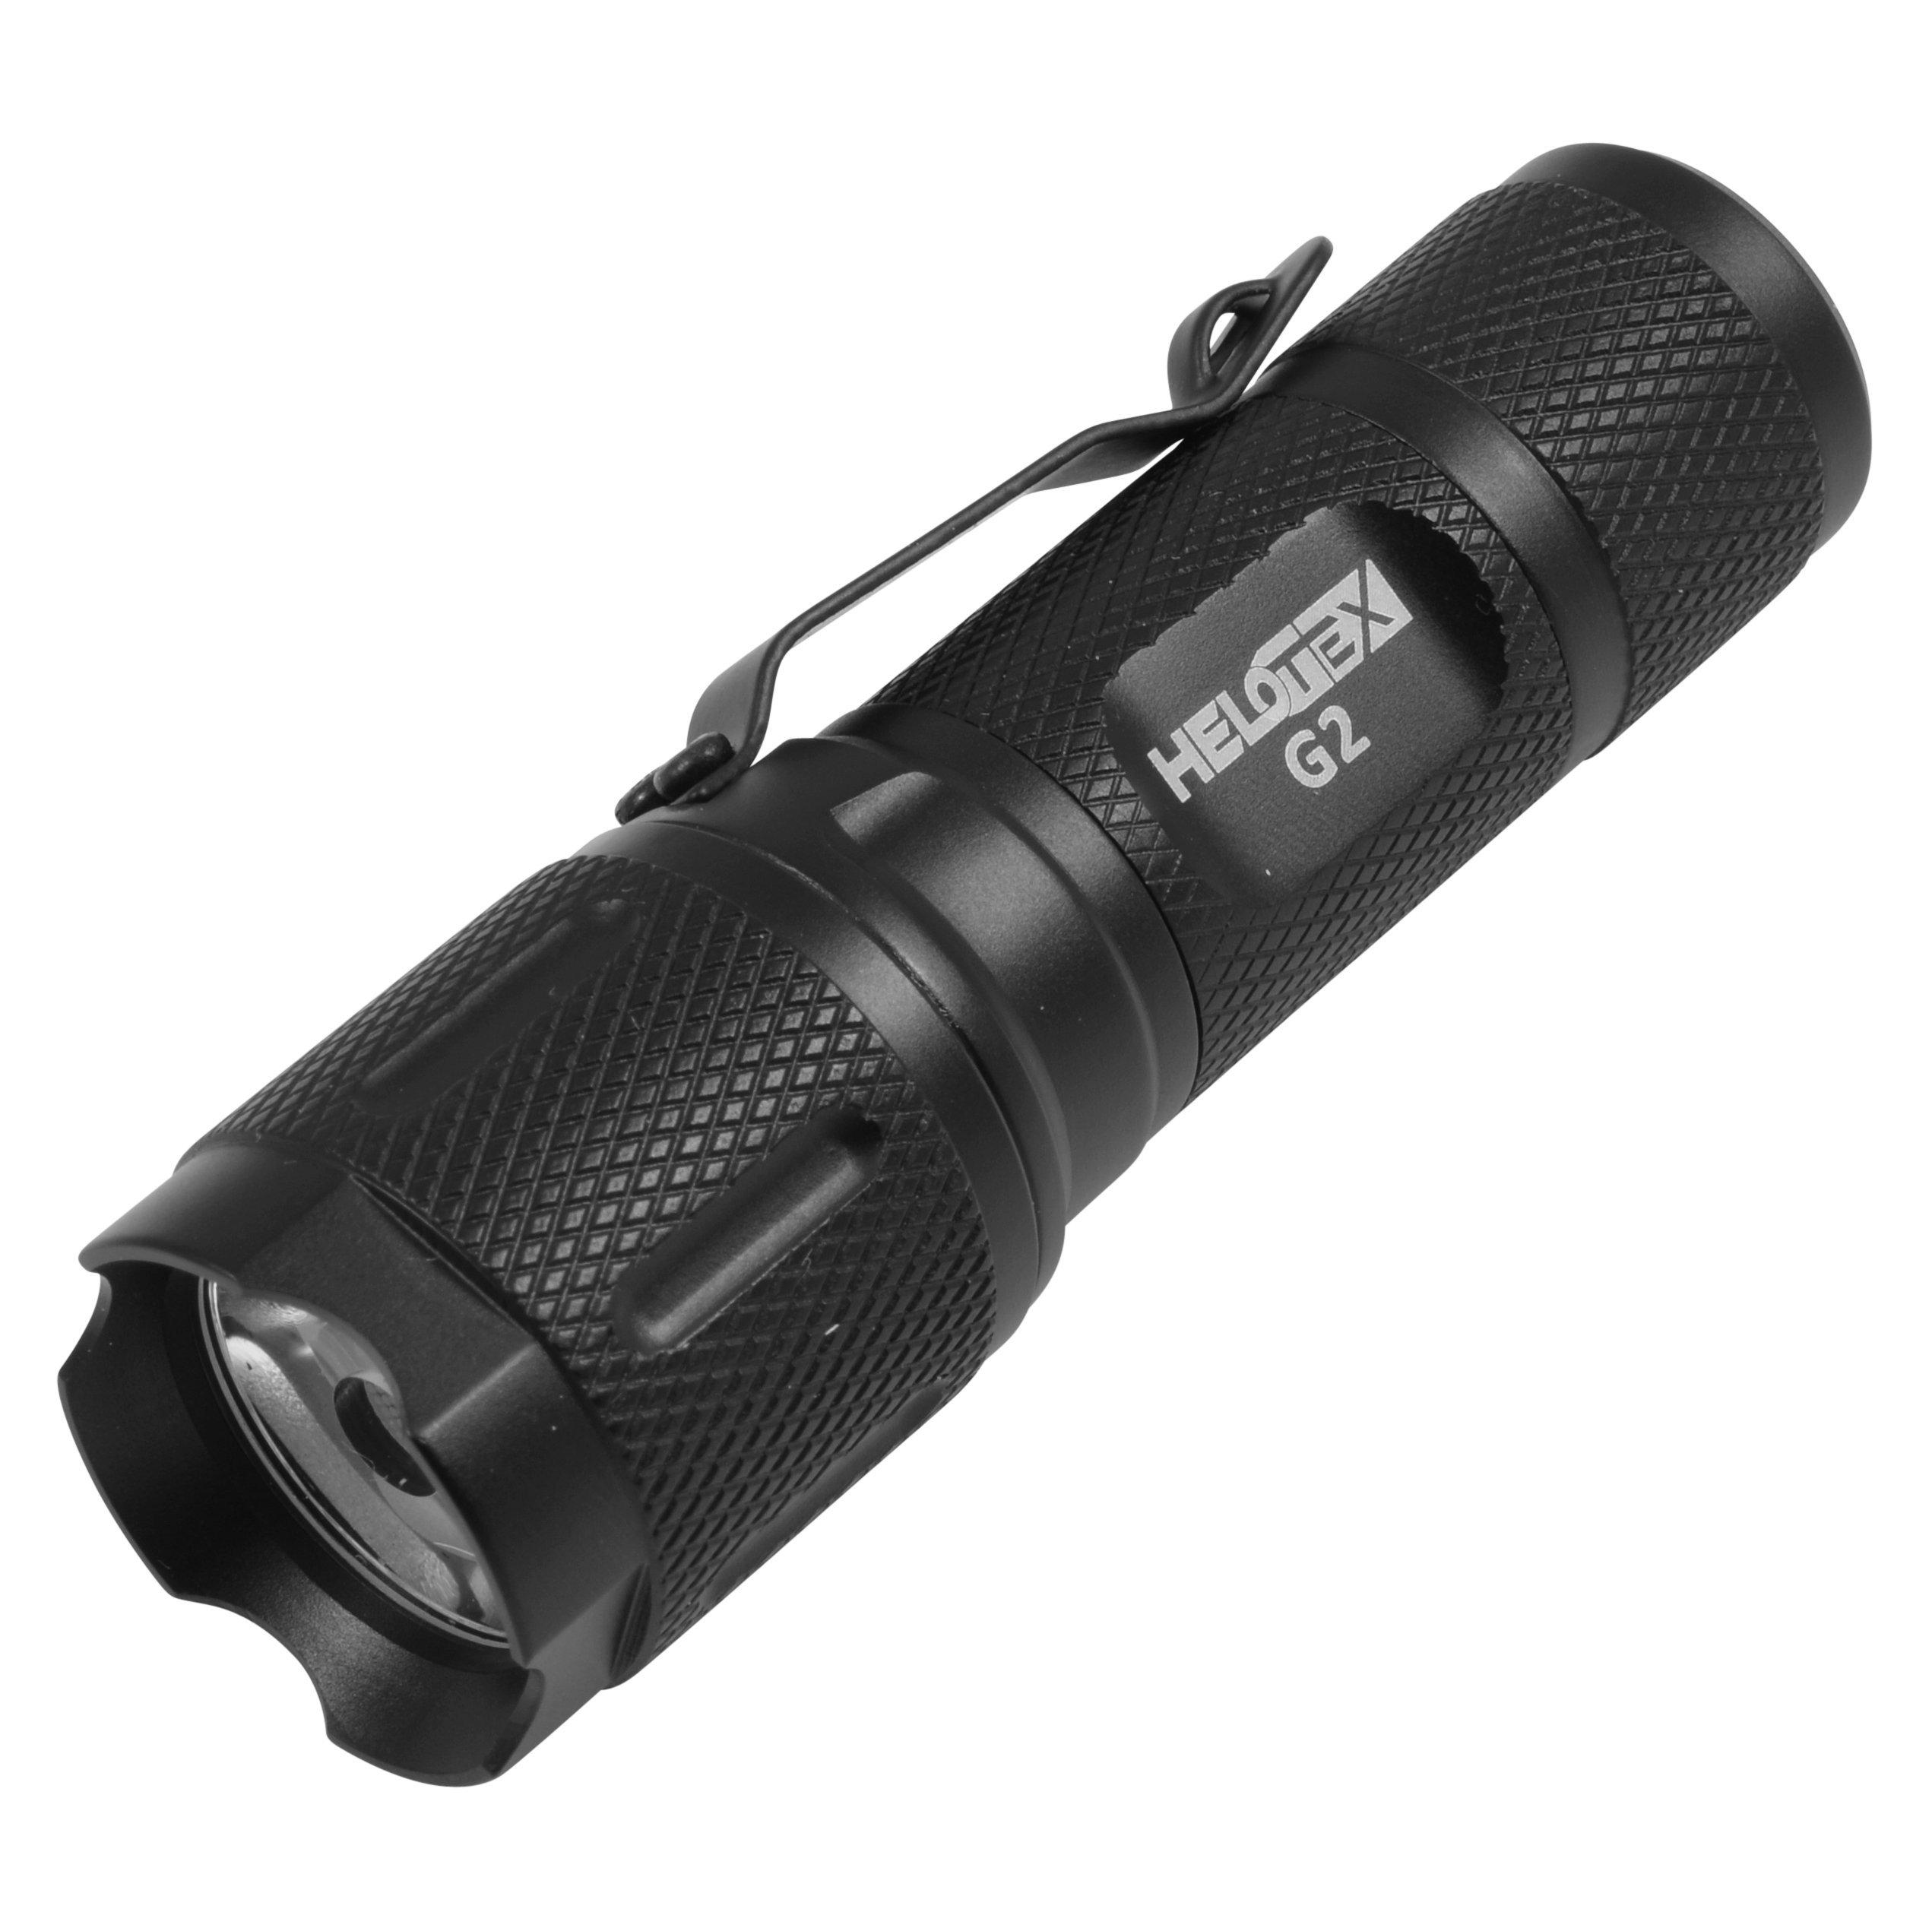 Helotex G2 CREE LED Tactical EDC Flashlight by Helotex